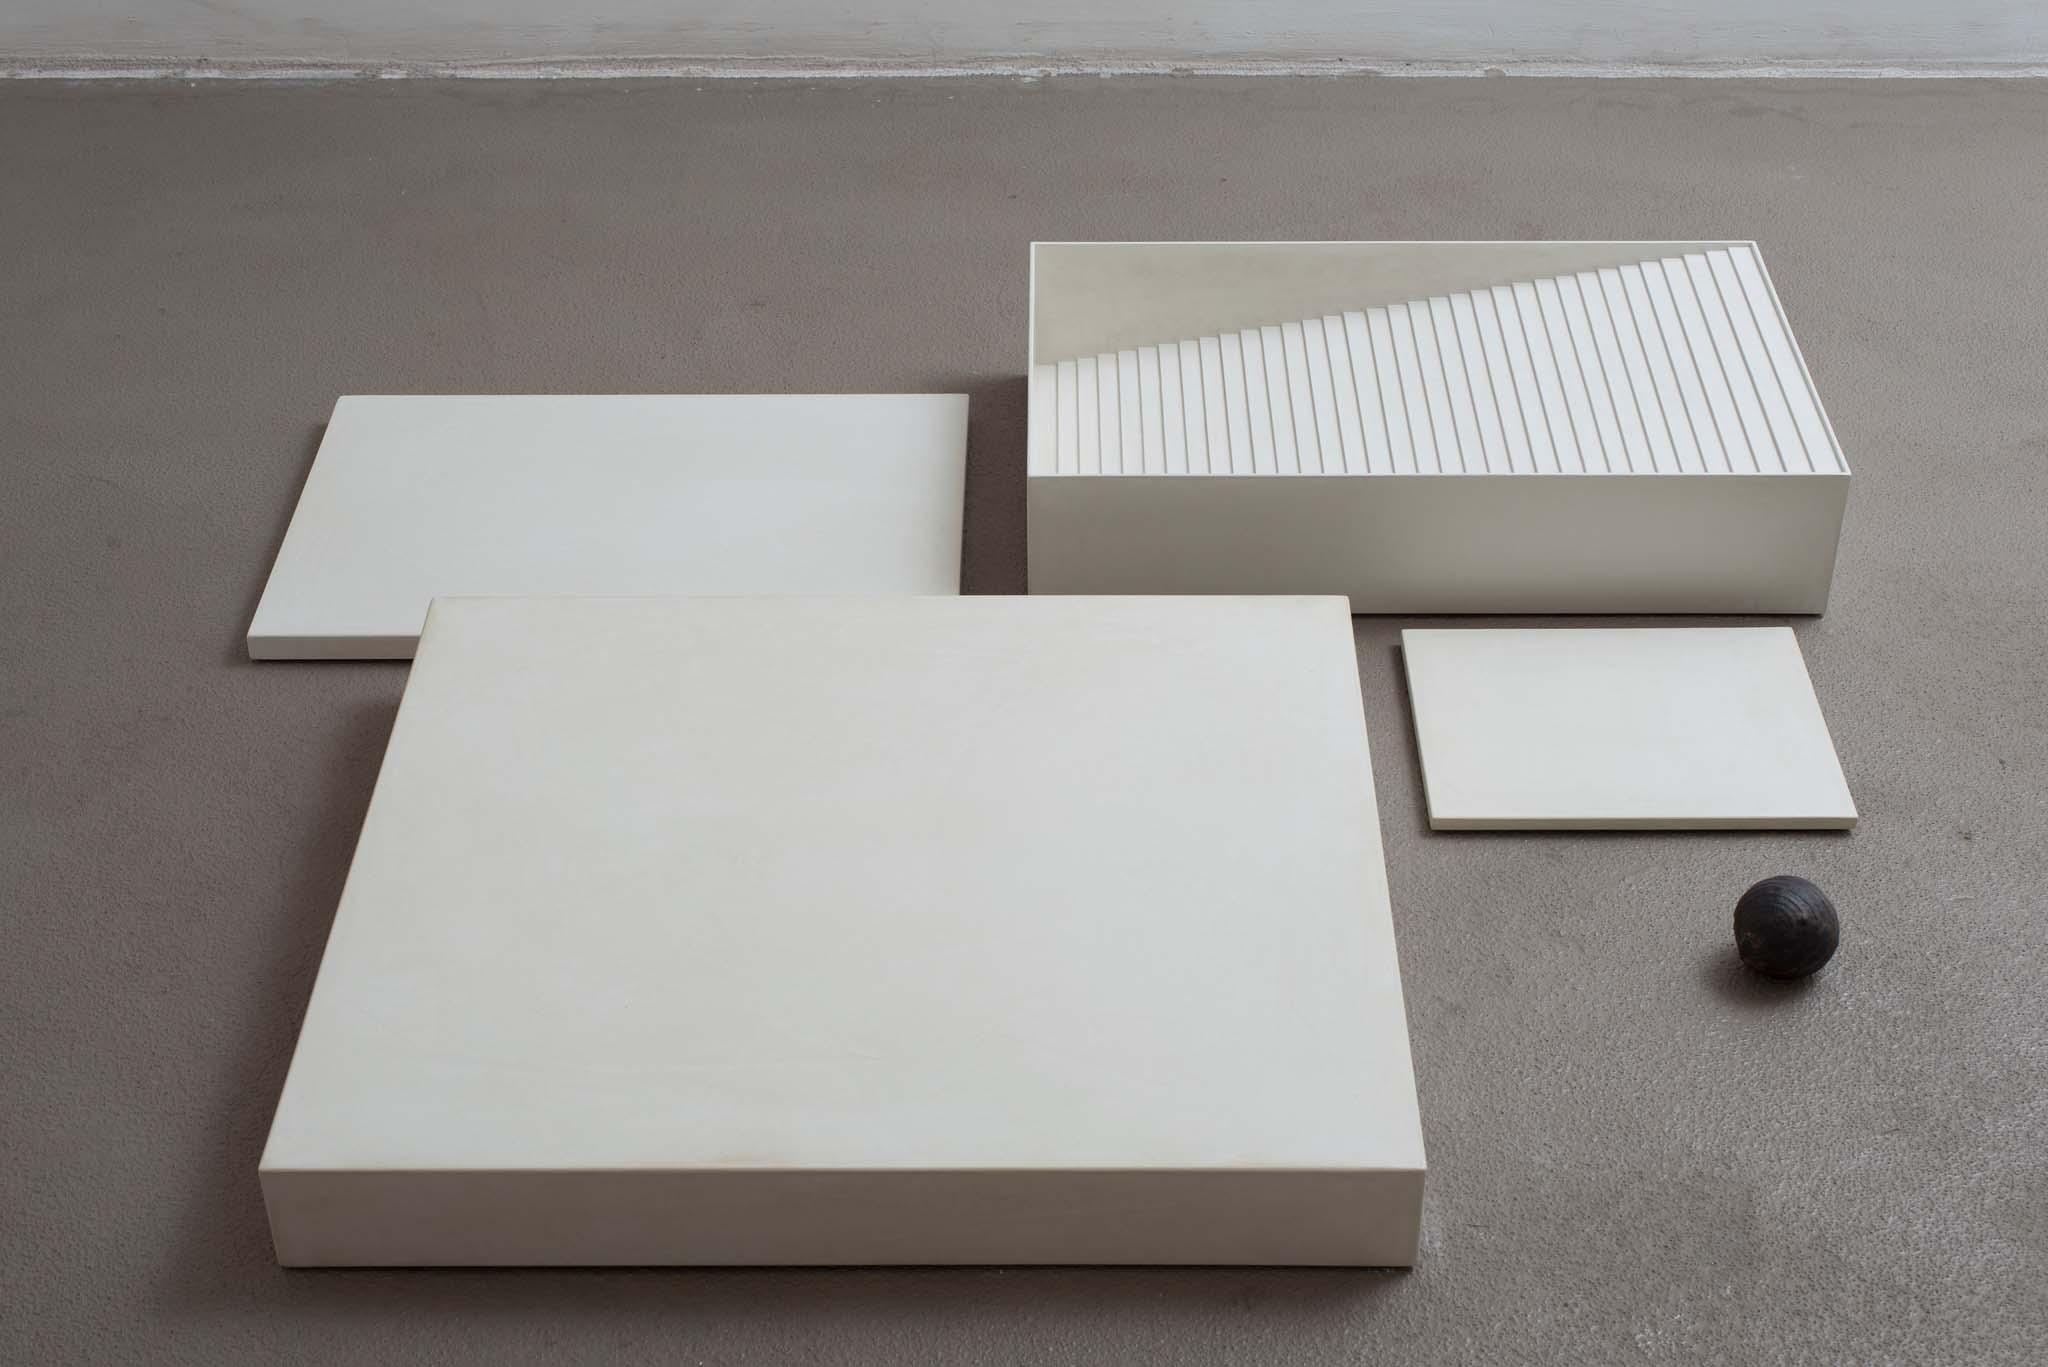 Haris Epaminonda Untitled #19 t/f, 2014  Courtesy Galleria Massimo Minini and the artist